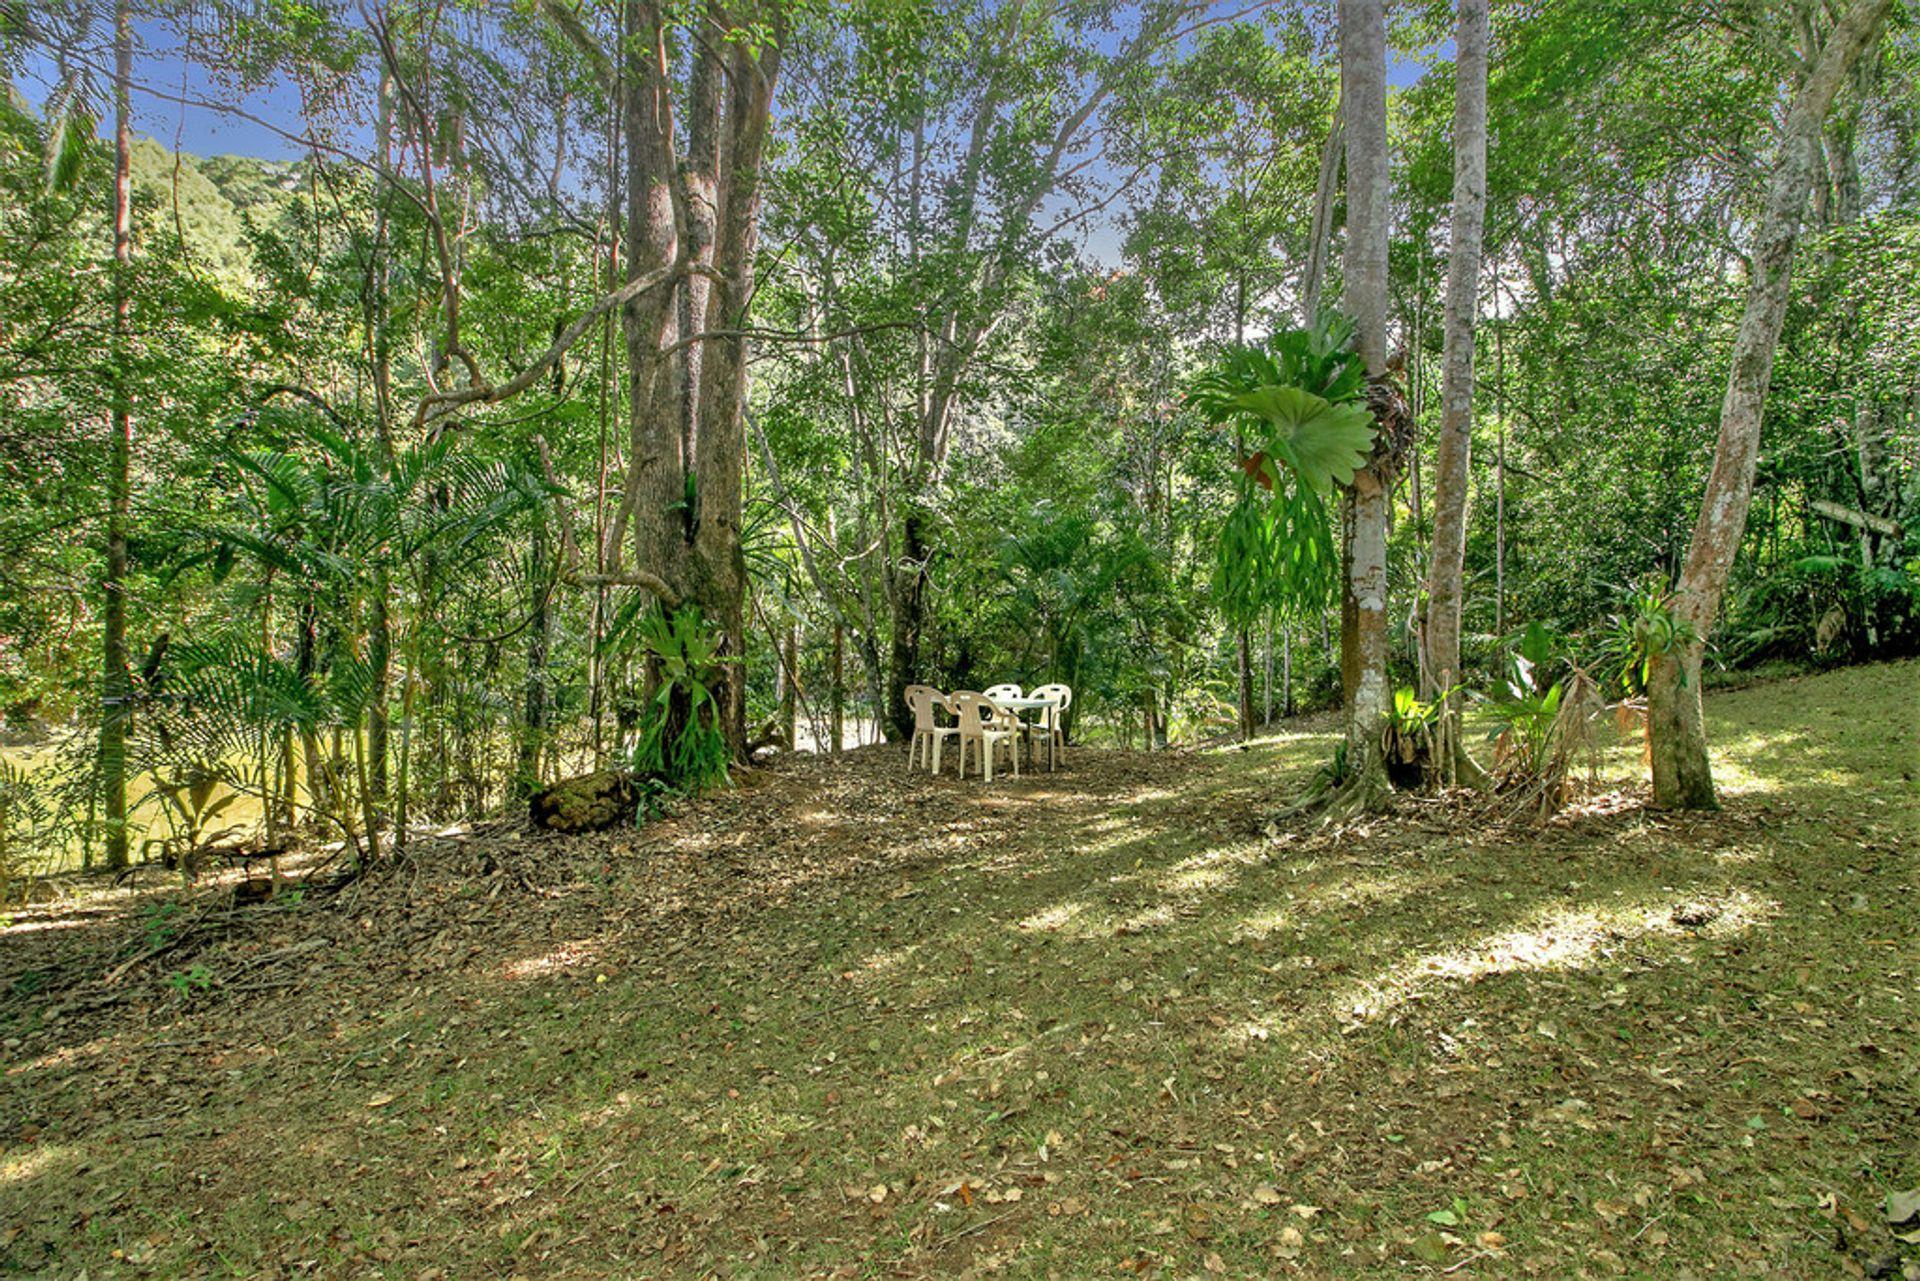 851 Reserve Creek Road Reserve Creek - NSW